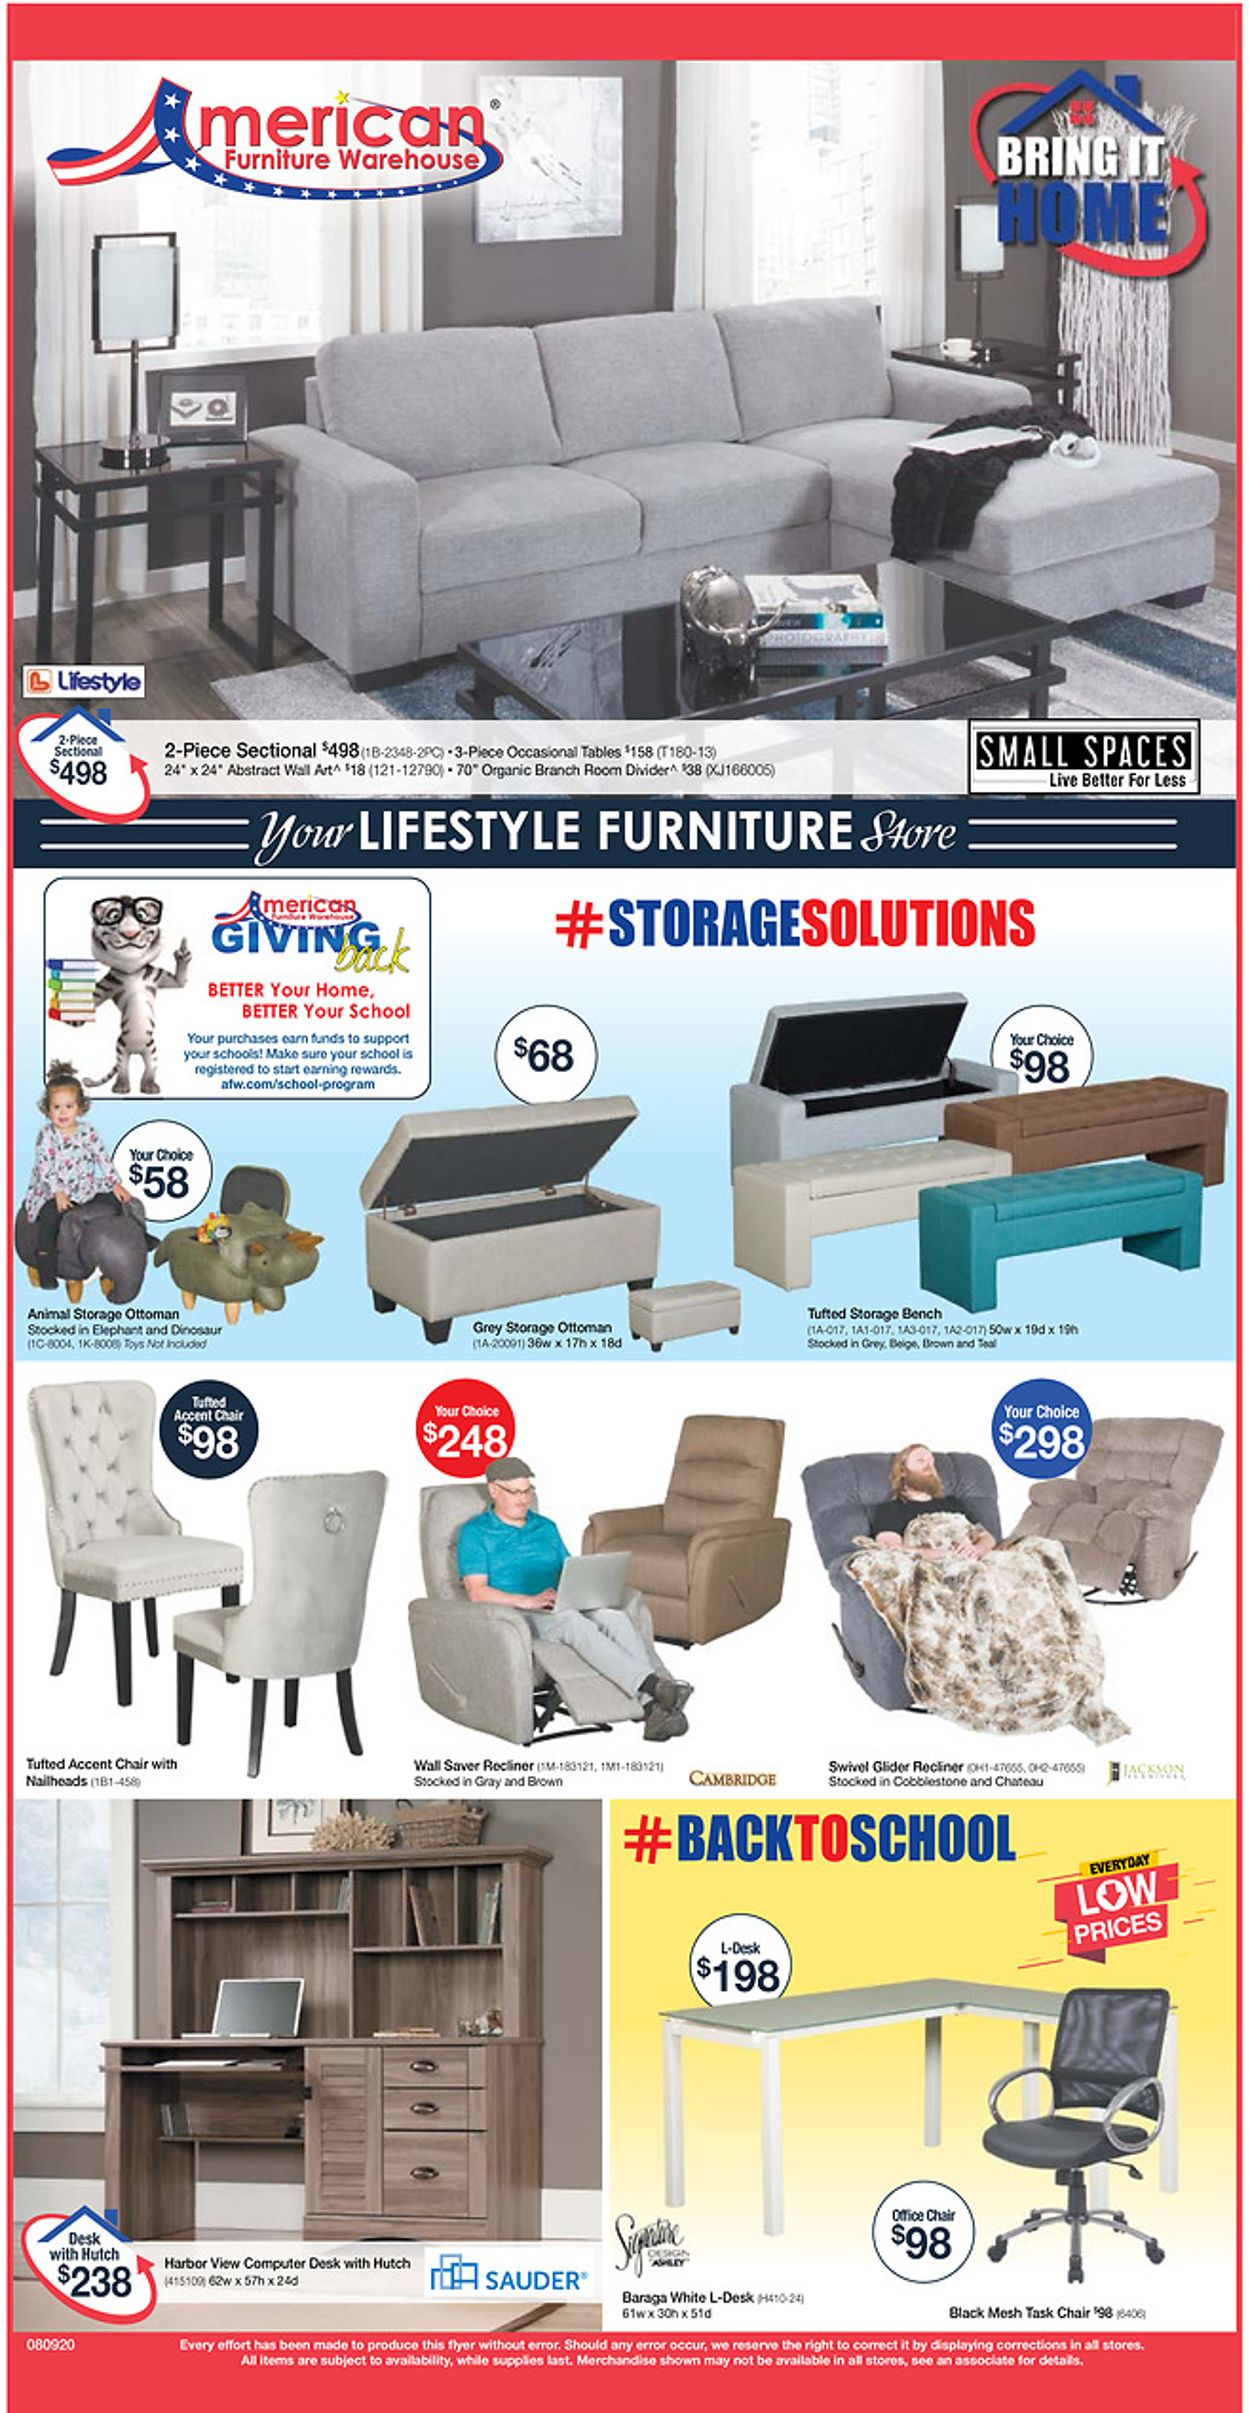 American Furniture Warehouse Weekly Ad Circular - valid 08/10-08/16/2020